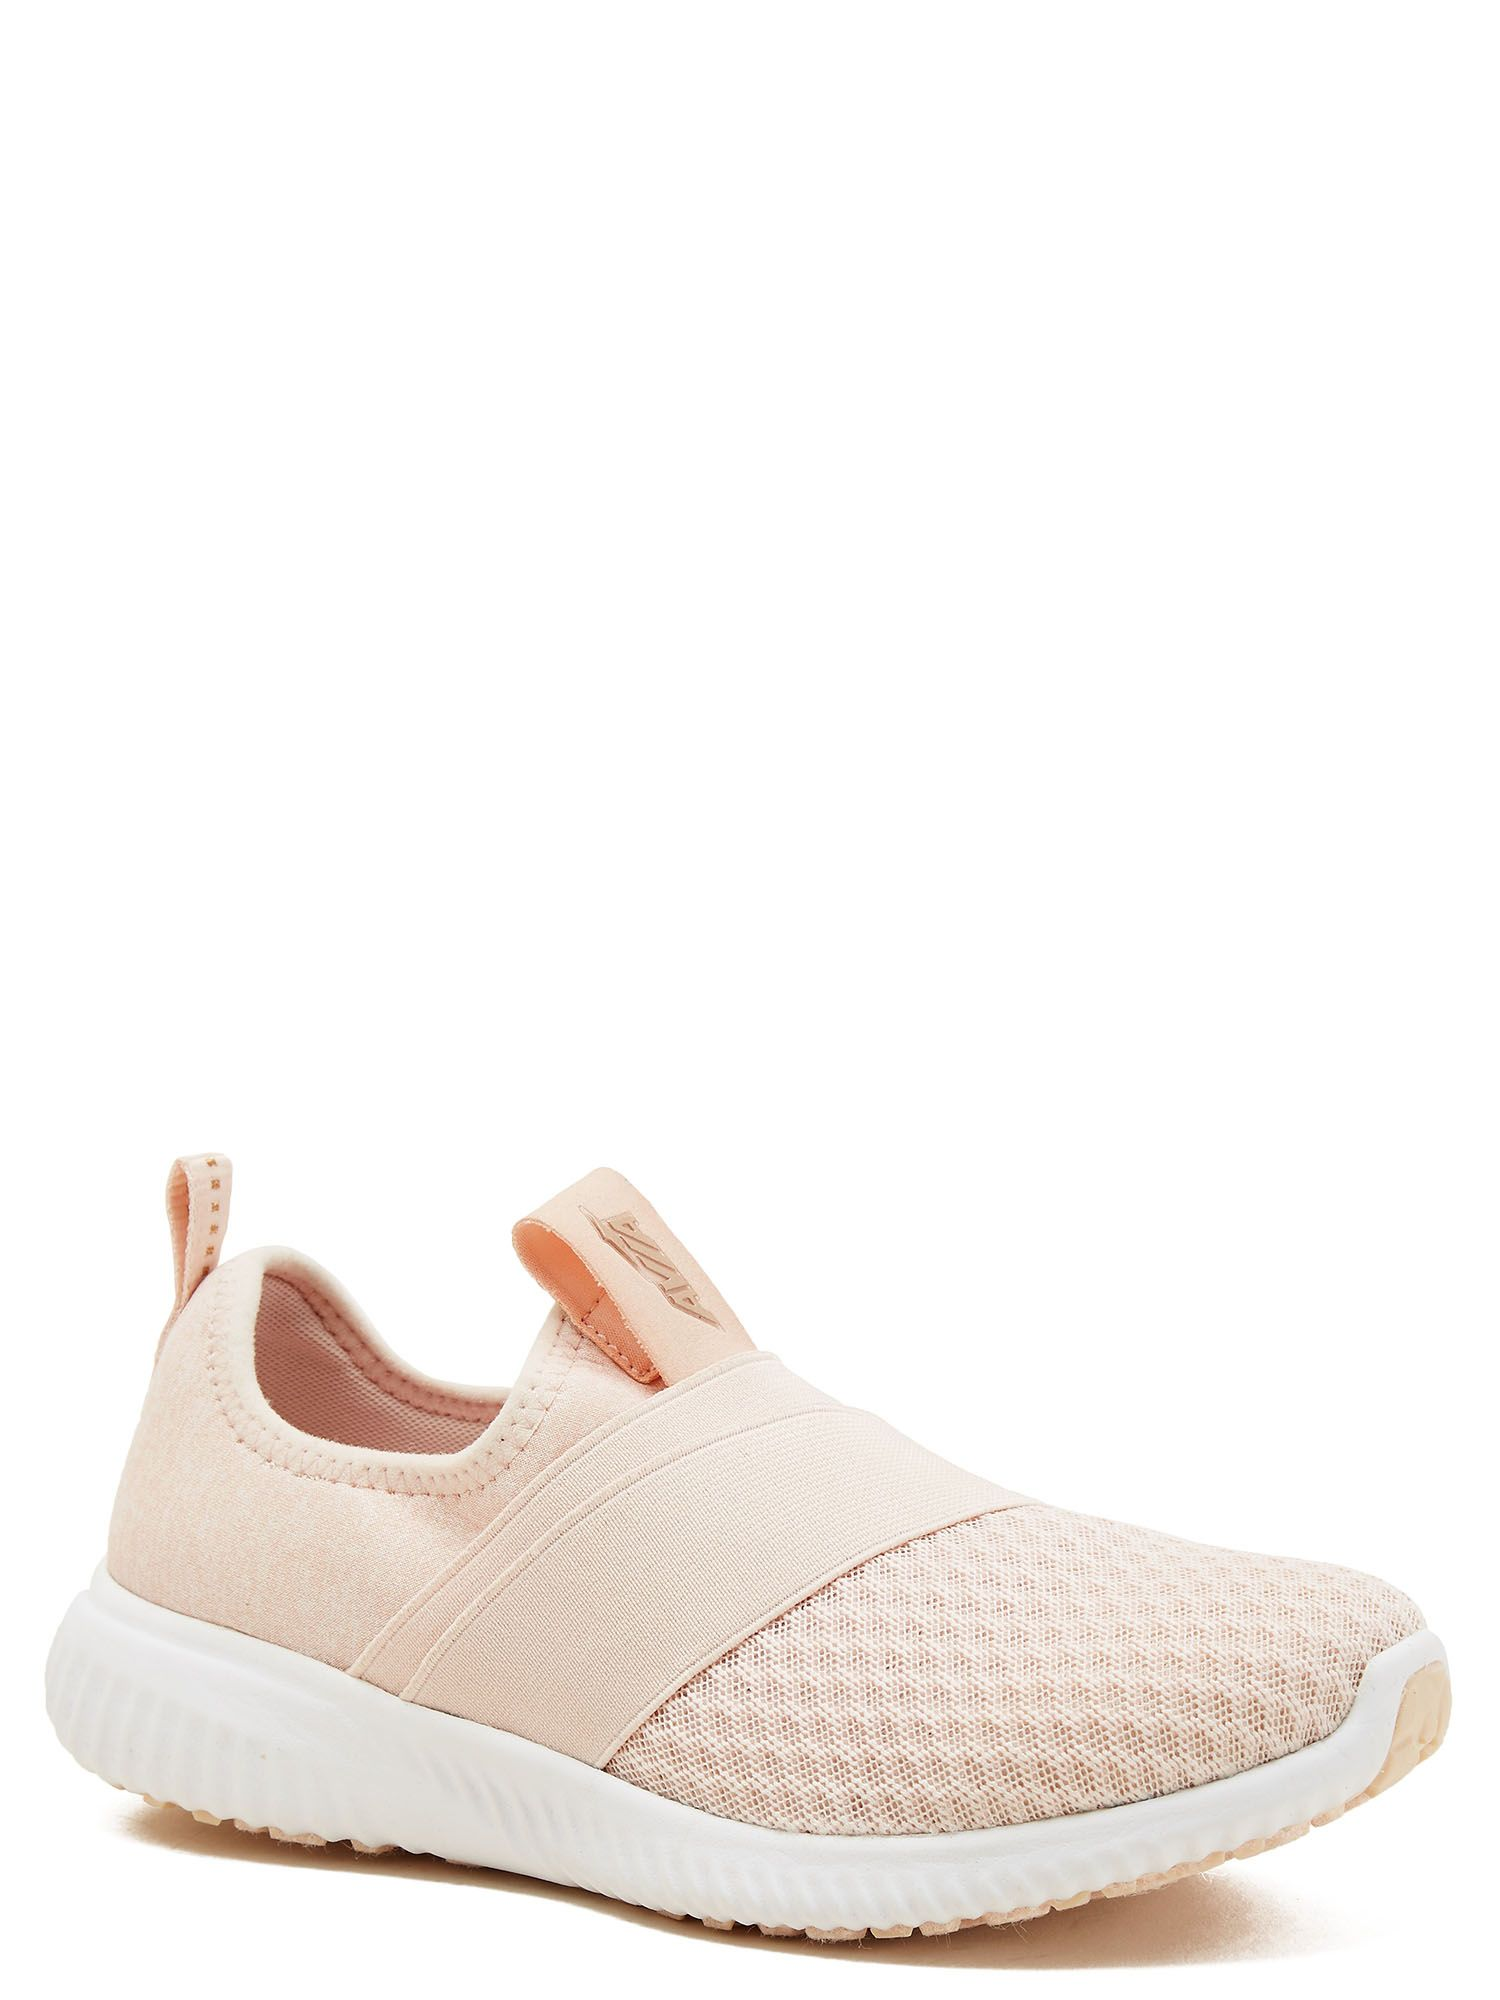 Avia Avia Women S Asym Strap Athletic Shoe Walmart Com Womens Athletic Shoes Athletic Shoes Ladies Shoes Designer [ 2000 x 1500 Pixel ]